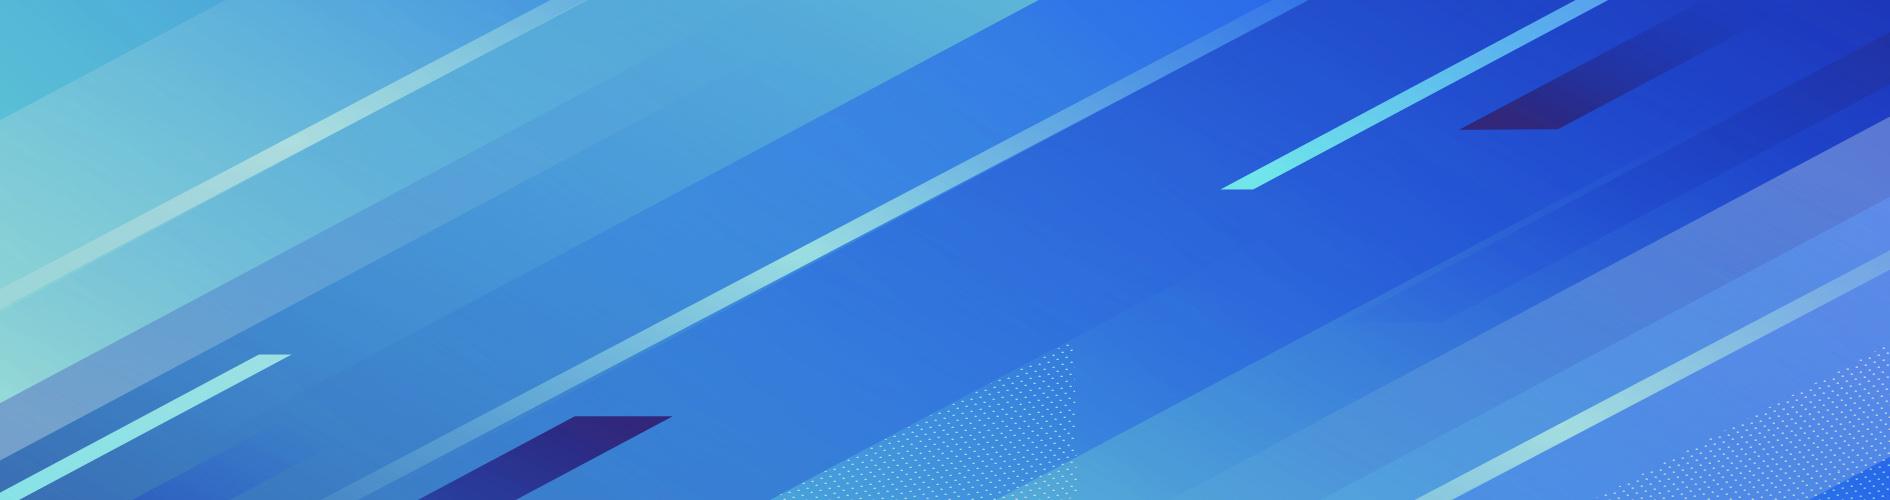 fondo azul blaumat